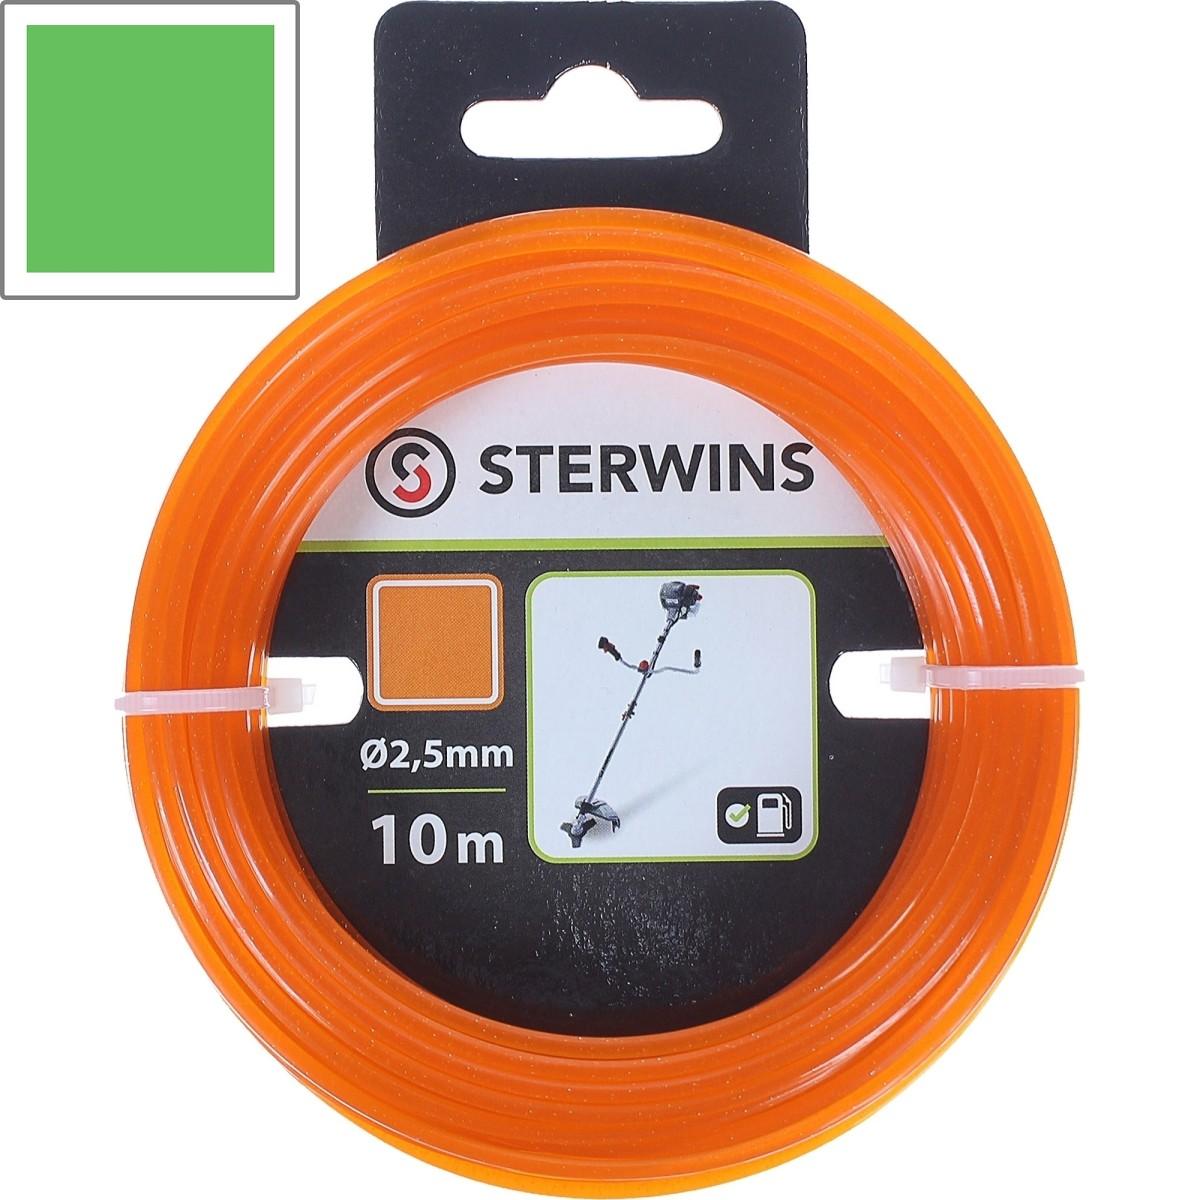 Леска для триммера Sterwins 2.5 мм х 10 м квадратная цвет оранжевый